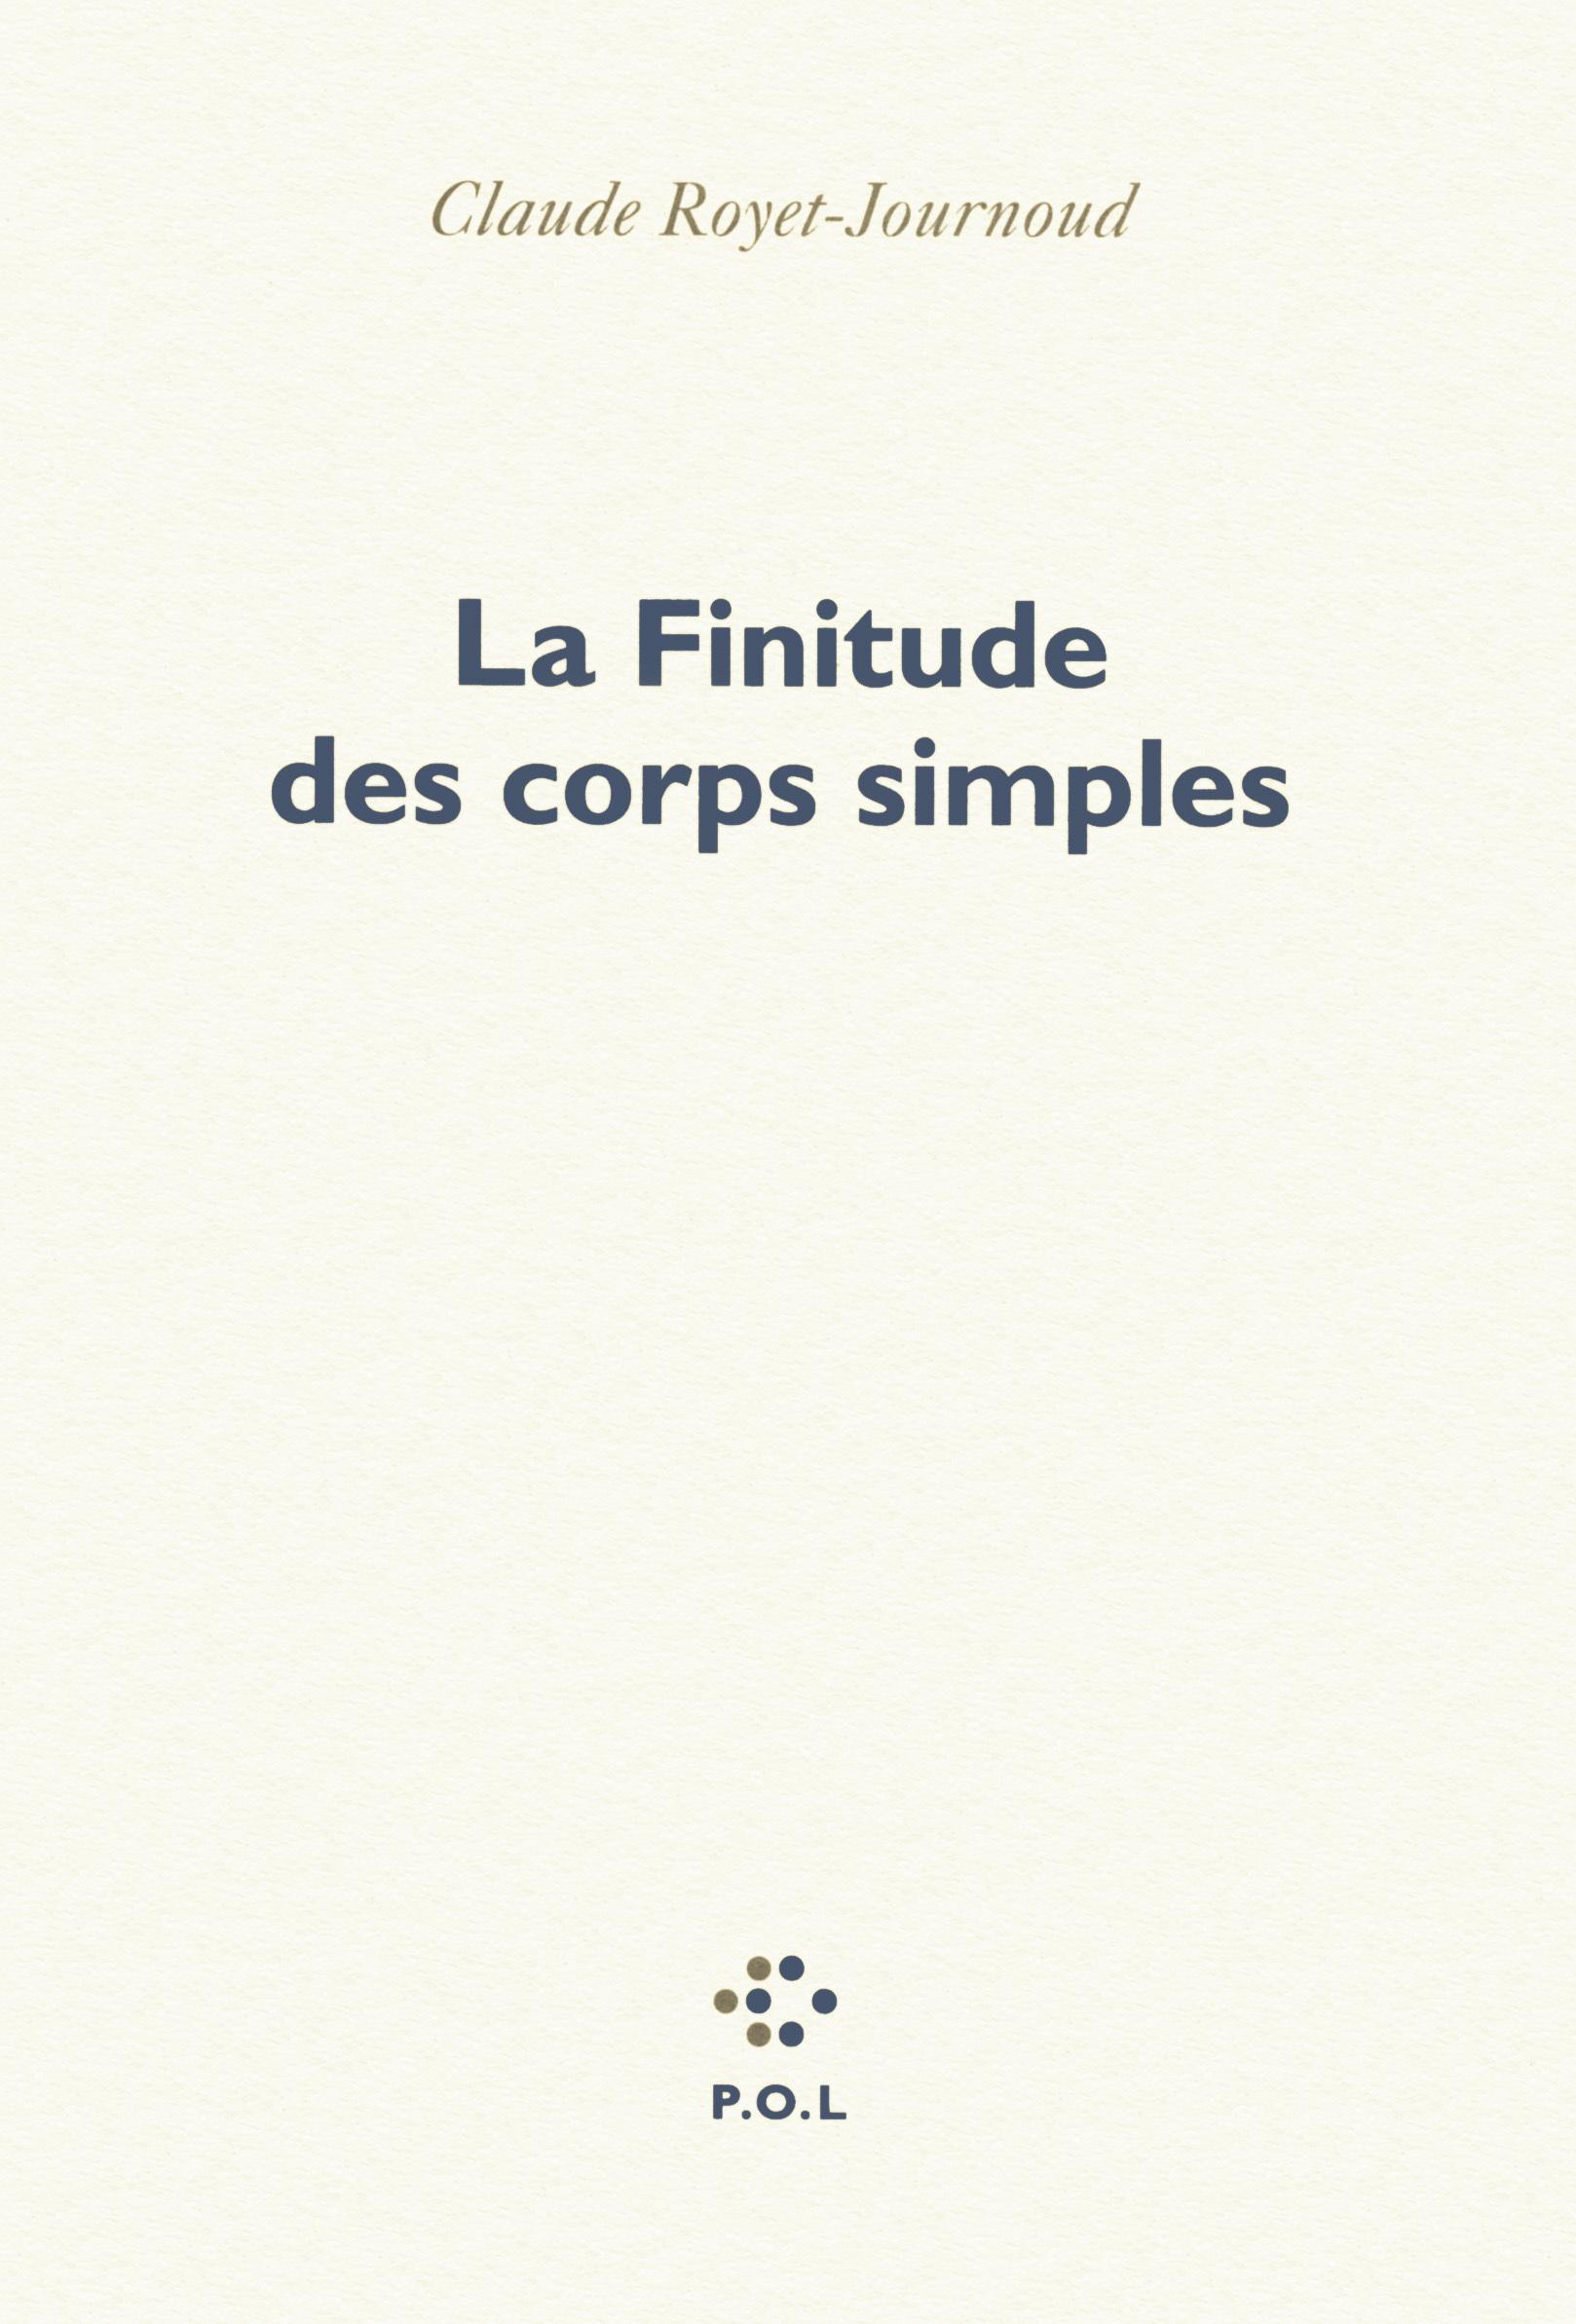 LA FINITUDE DES CORPS SIMPLES